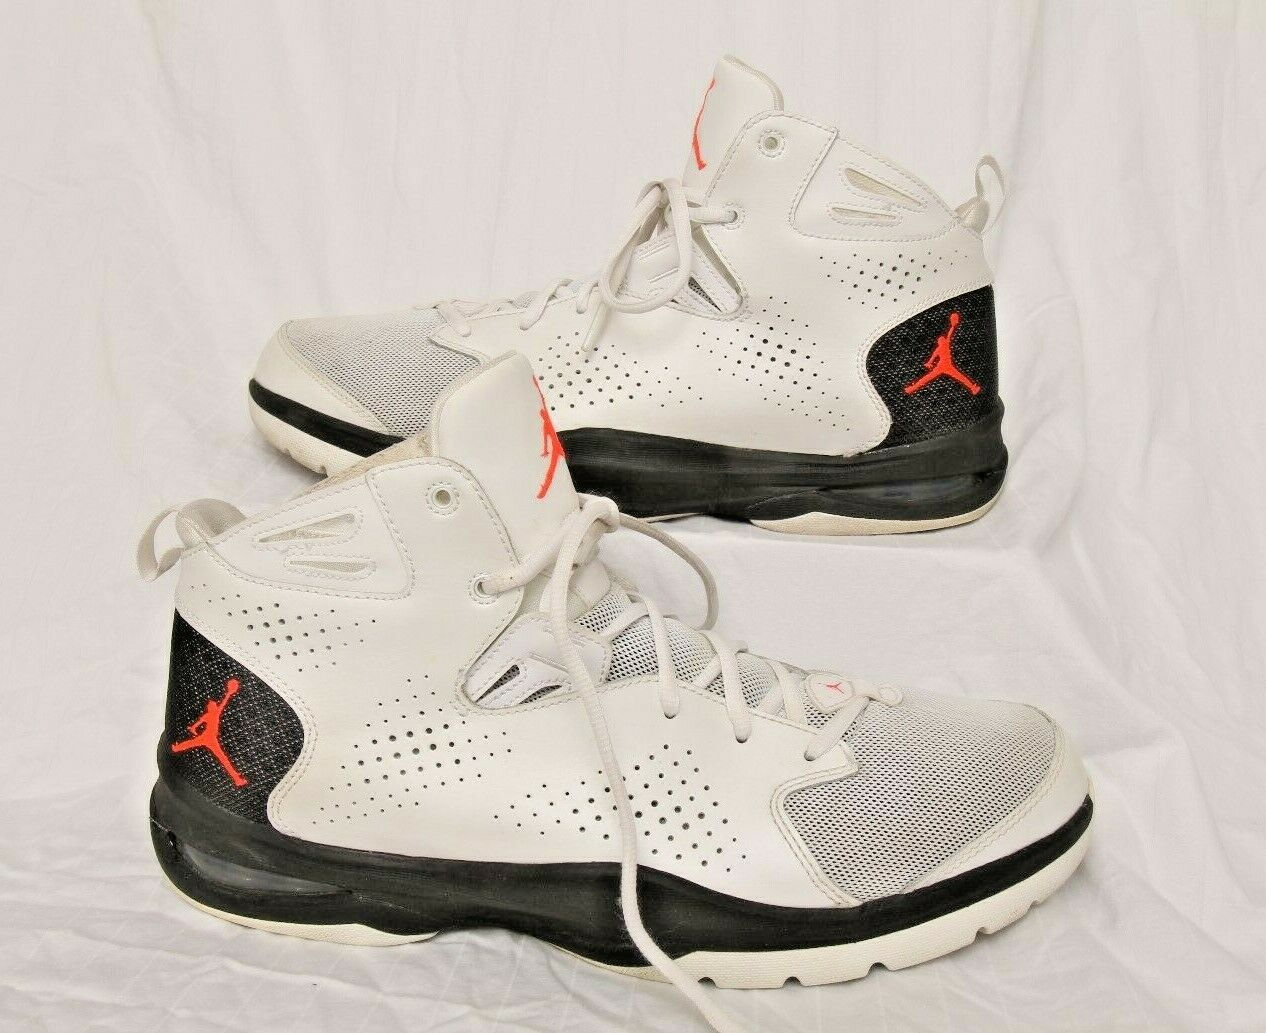 Jordan Men's Ace 23 II Performance Basketball shoes 644773-123 Size 11.5 GUC